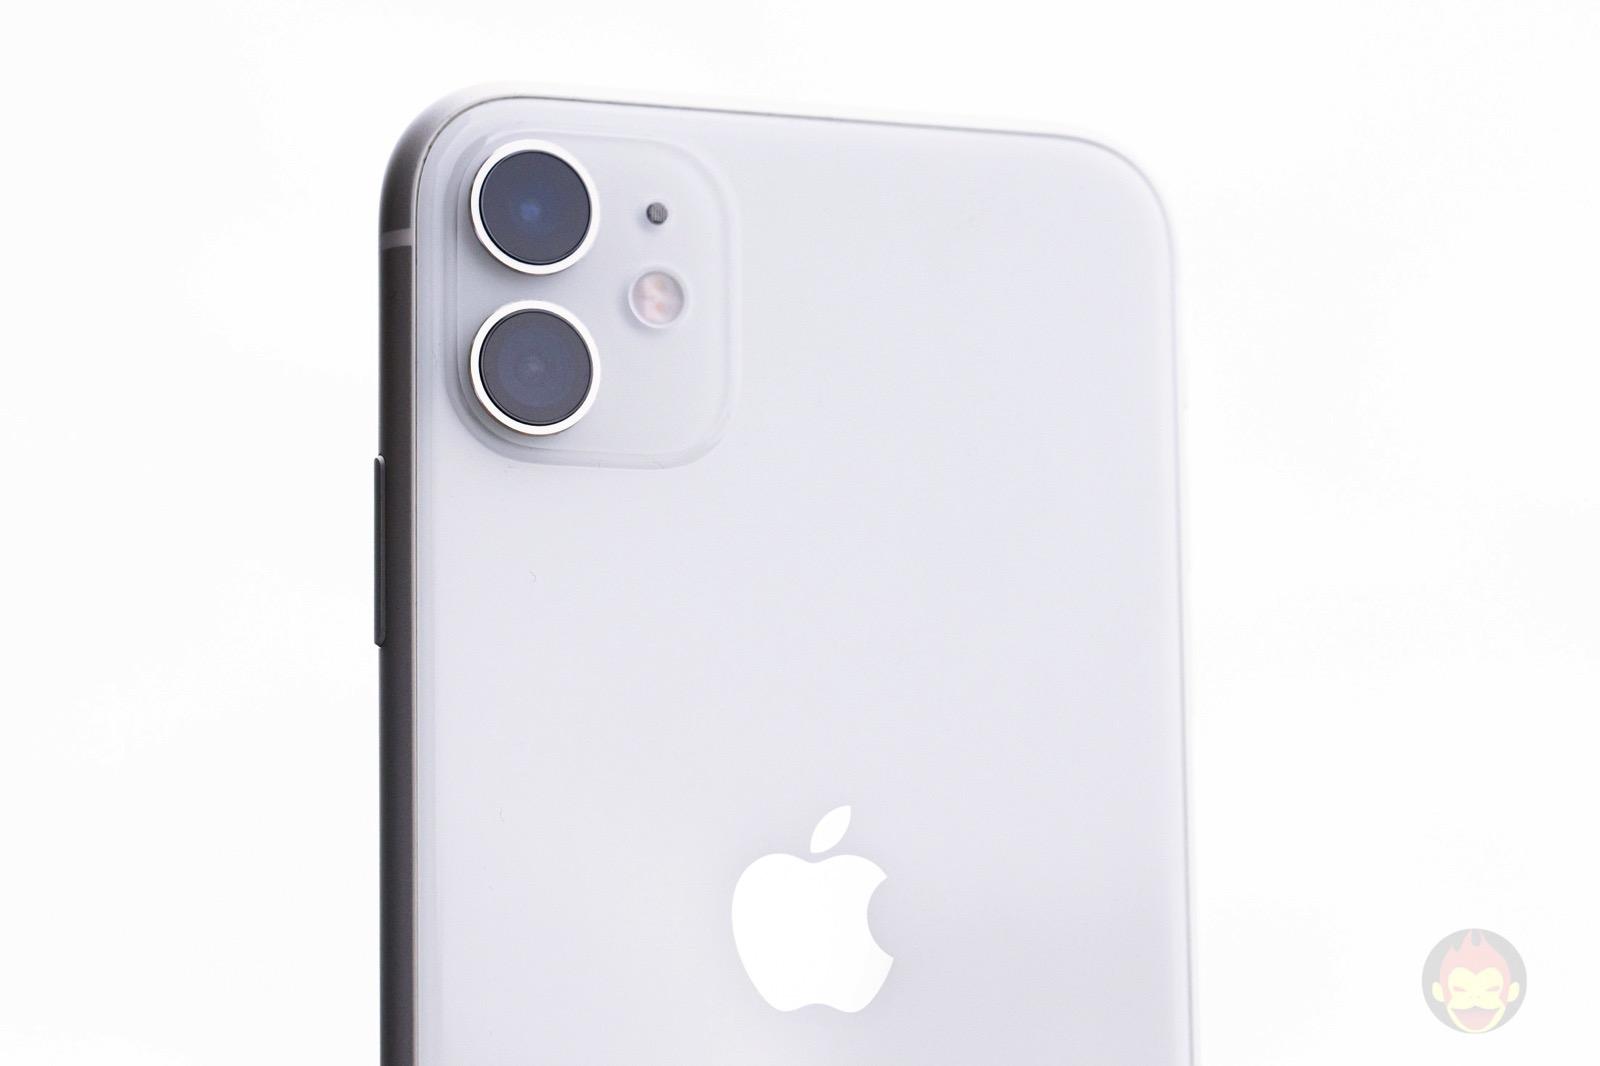 iphone-11-dual-cameras-01.jpg